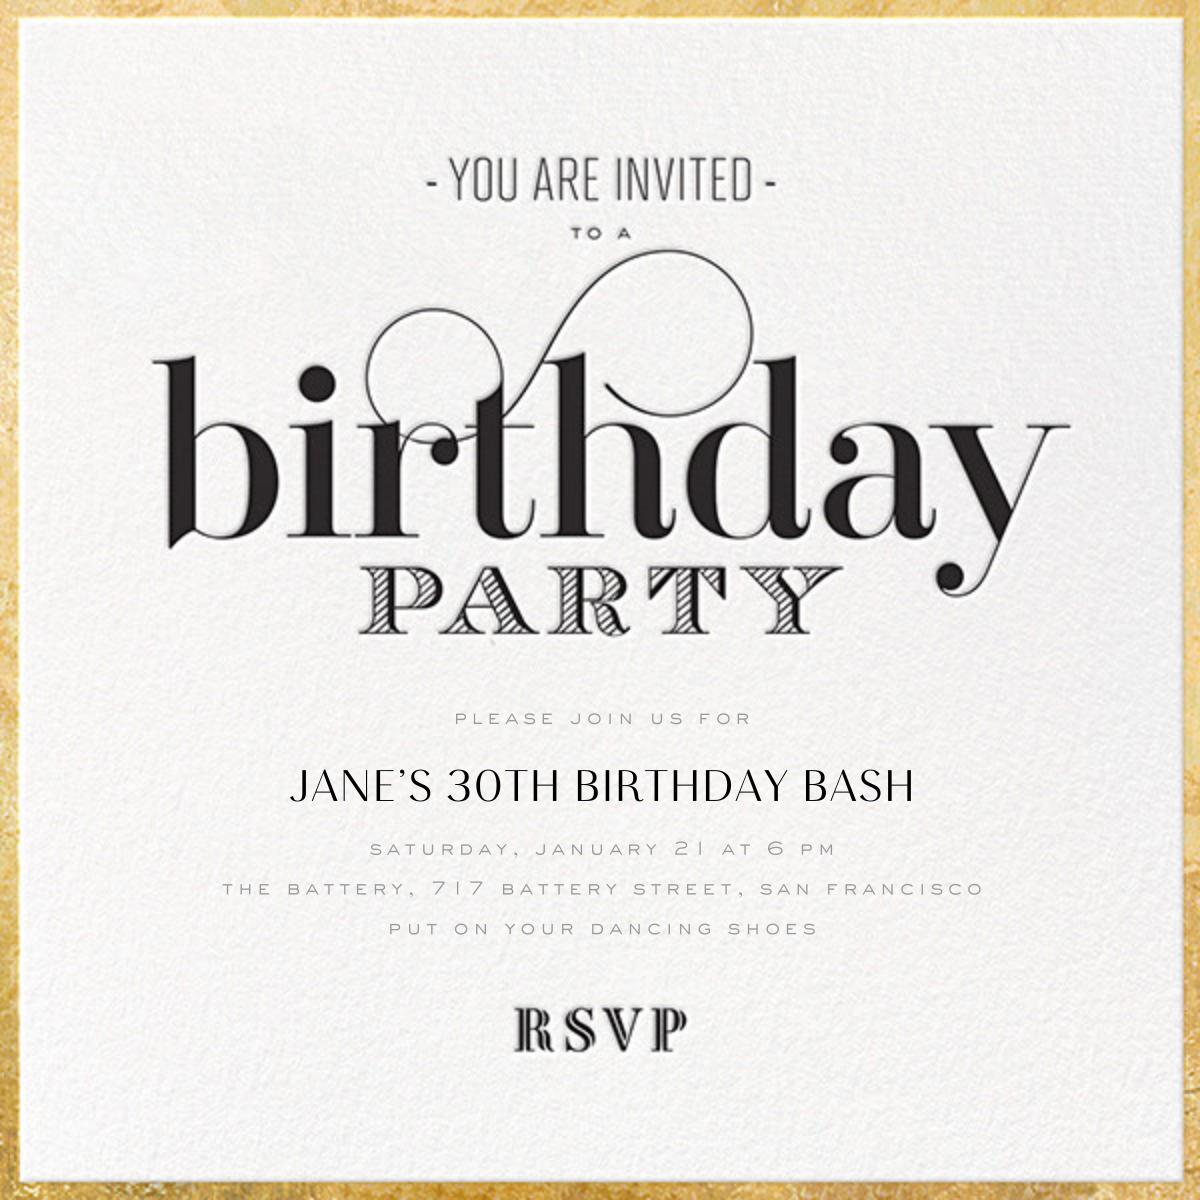 Birthday Swash - bluepoolroad - 50th birthday invitations